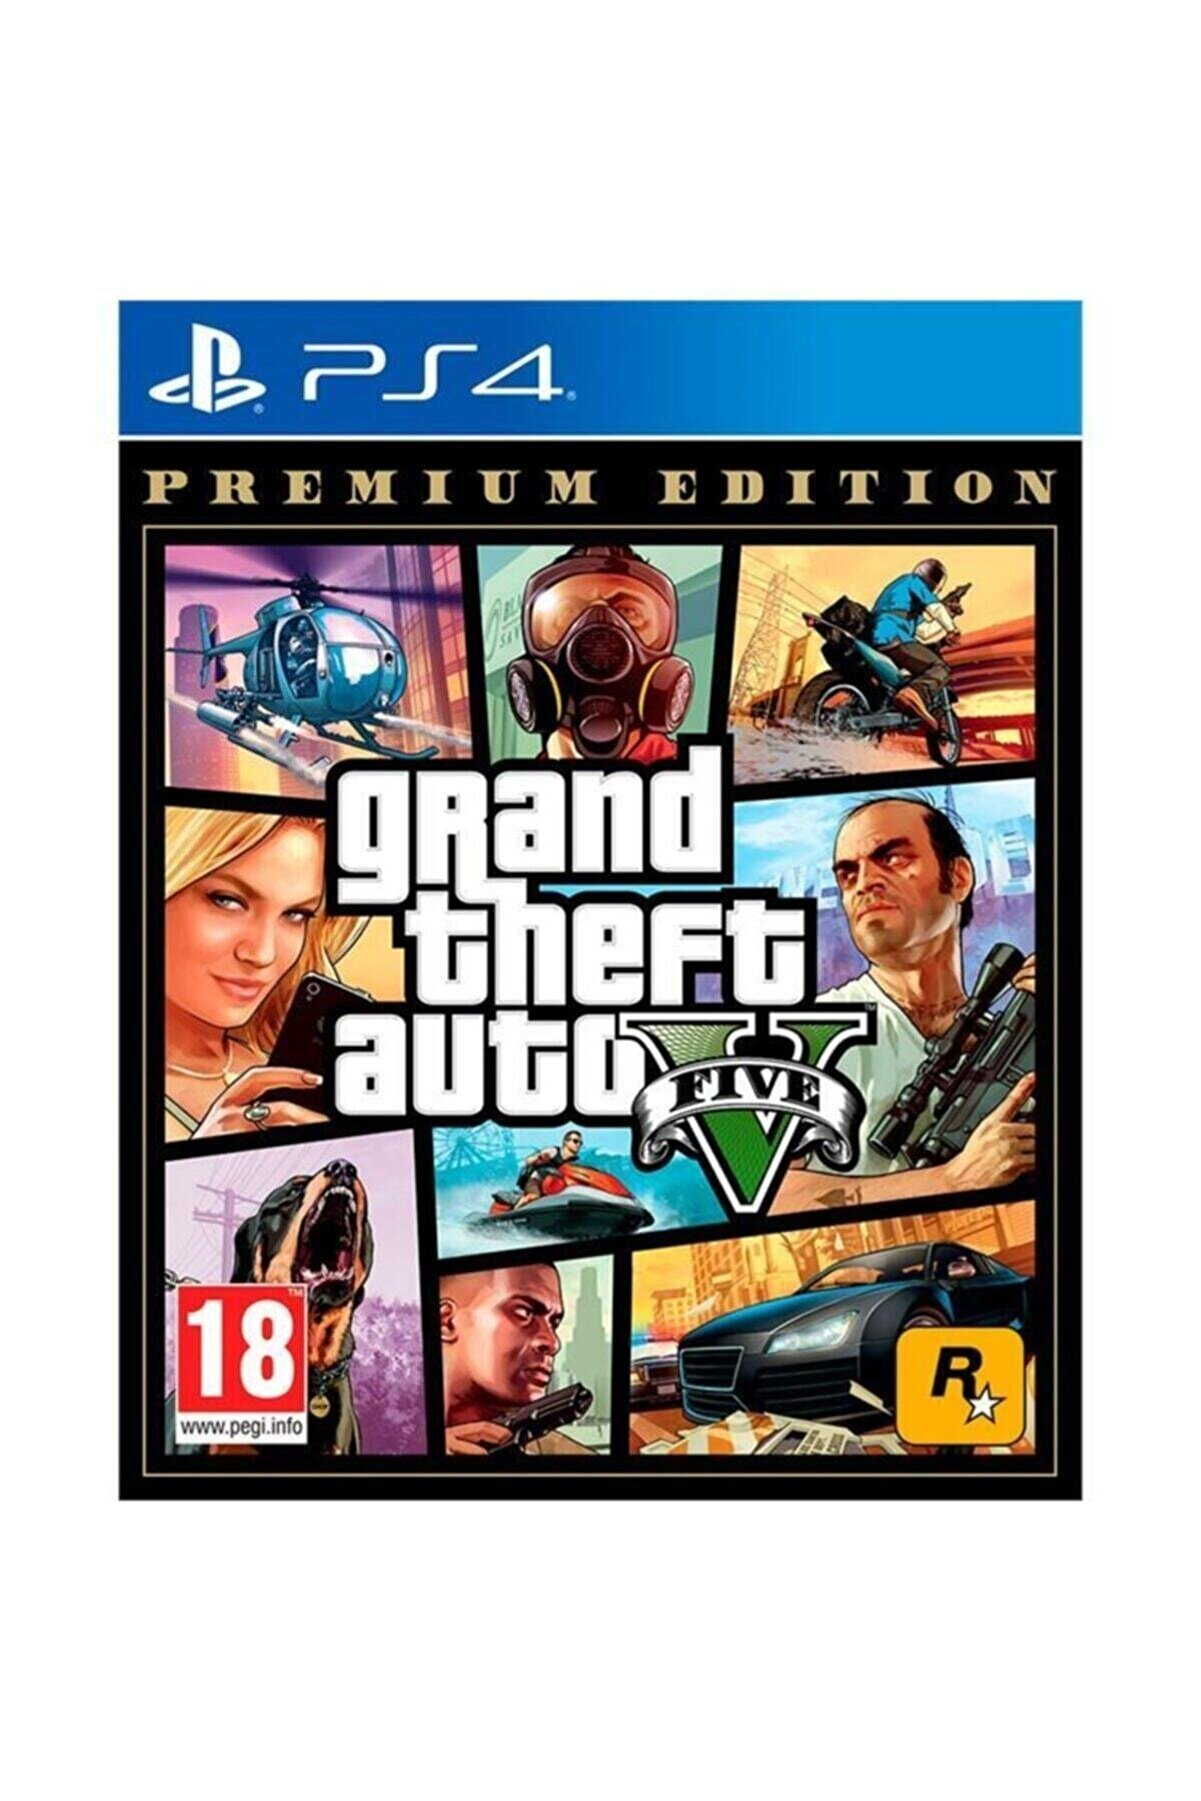 Rockstar Grand Theft Auto V Premium Edition PS4 Oyun - GTA 5